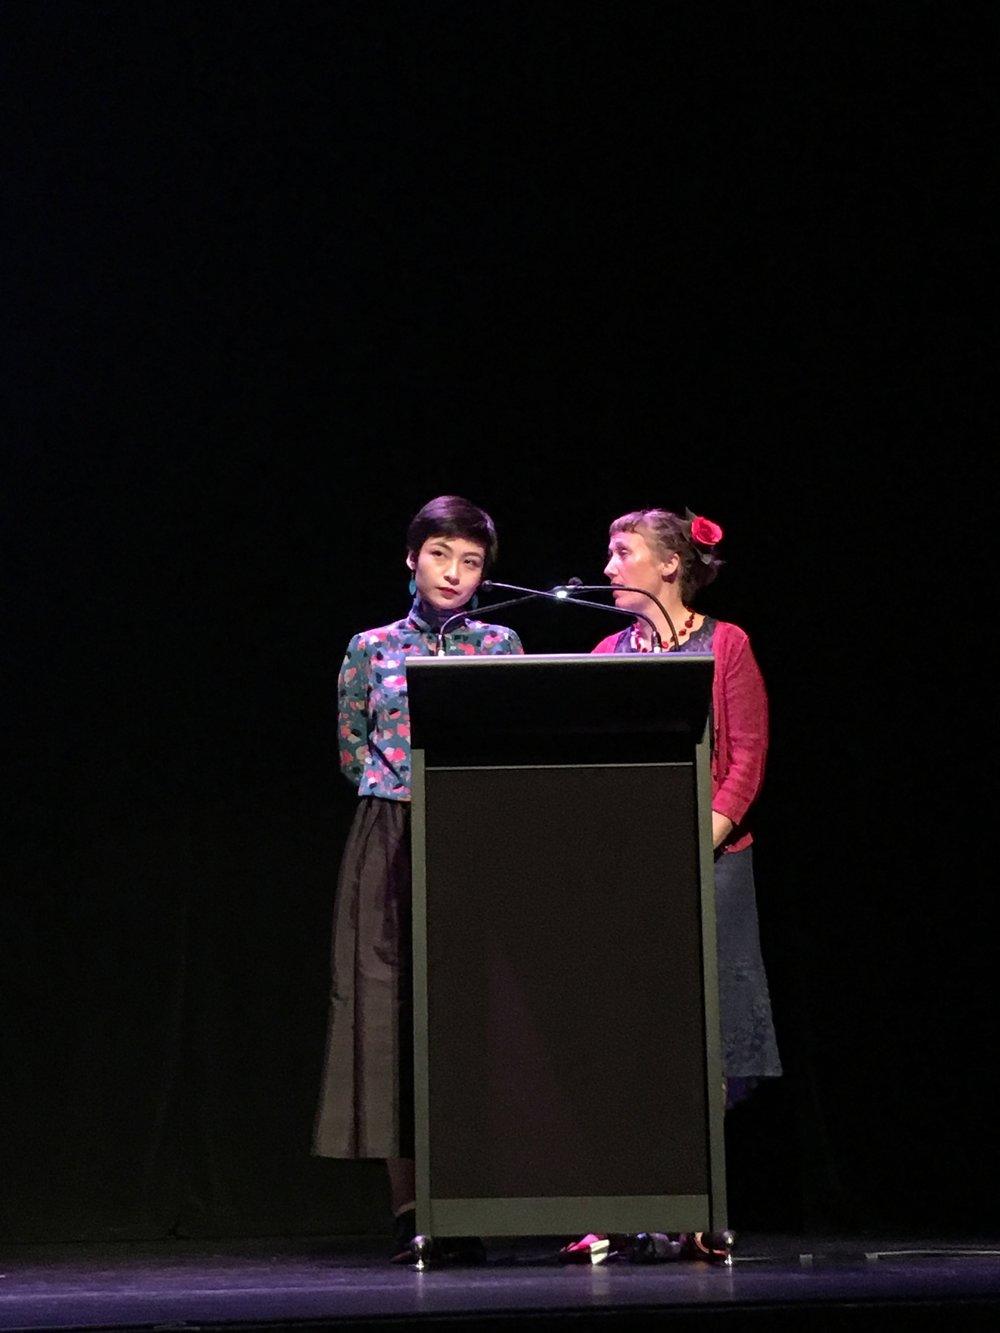 Felix Ching Ching Ho presenting